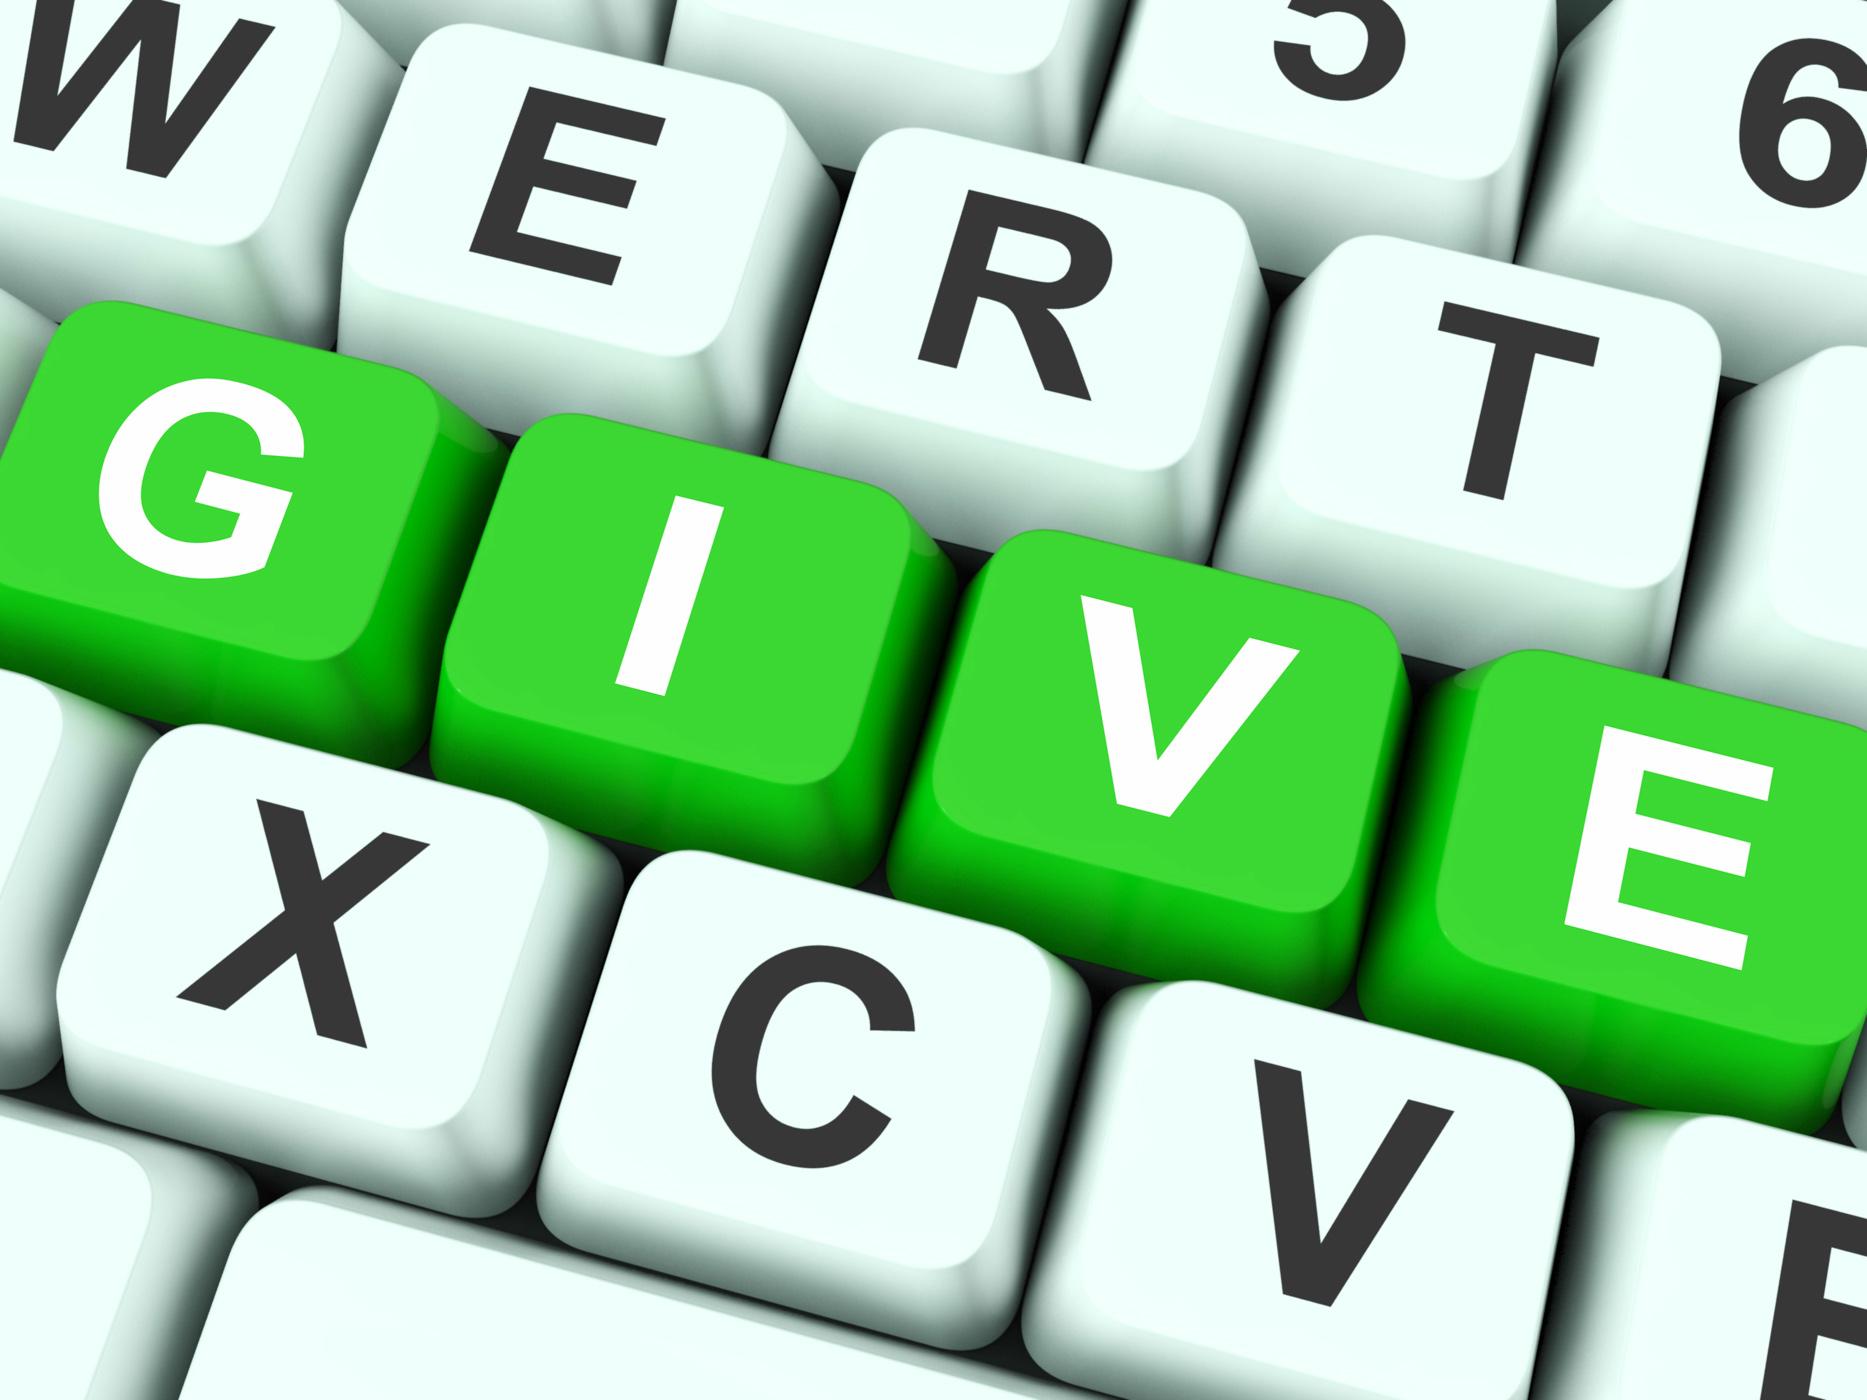 Give keys show bestowed or deliver photo